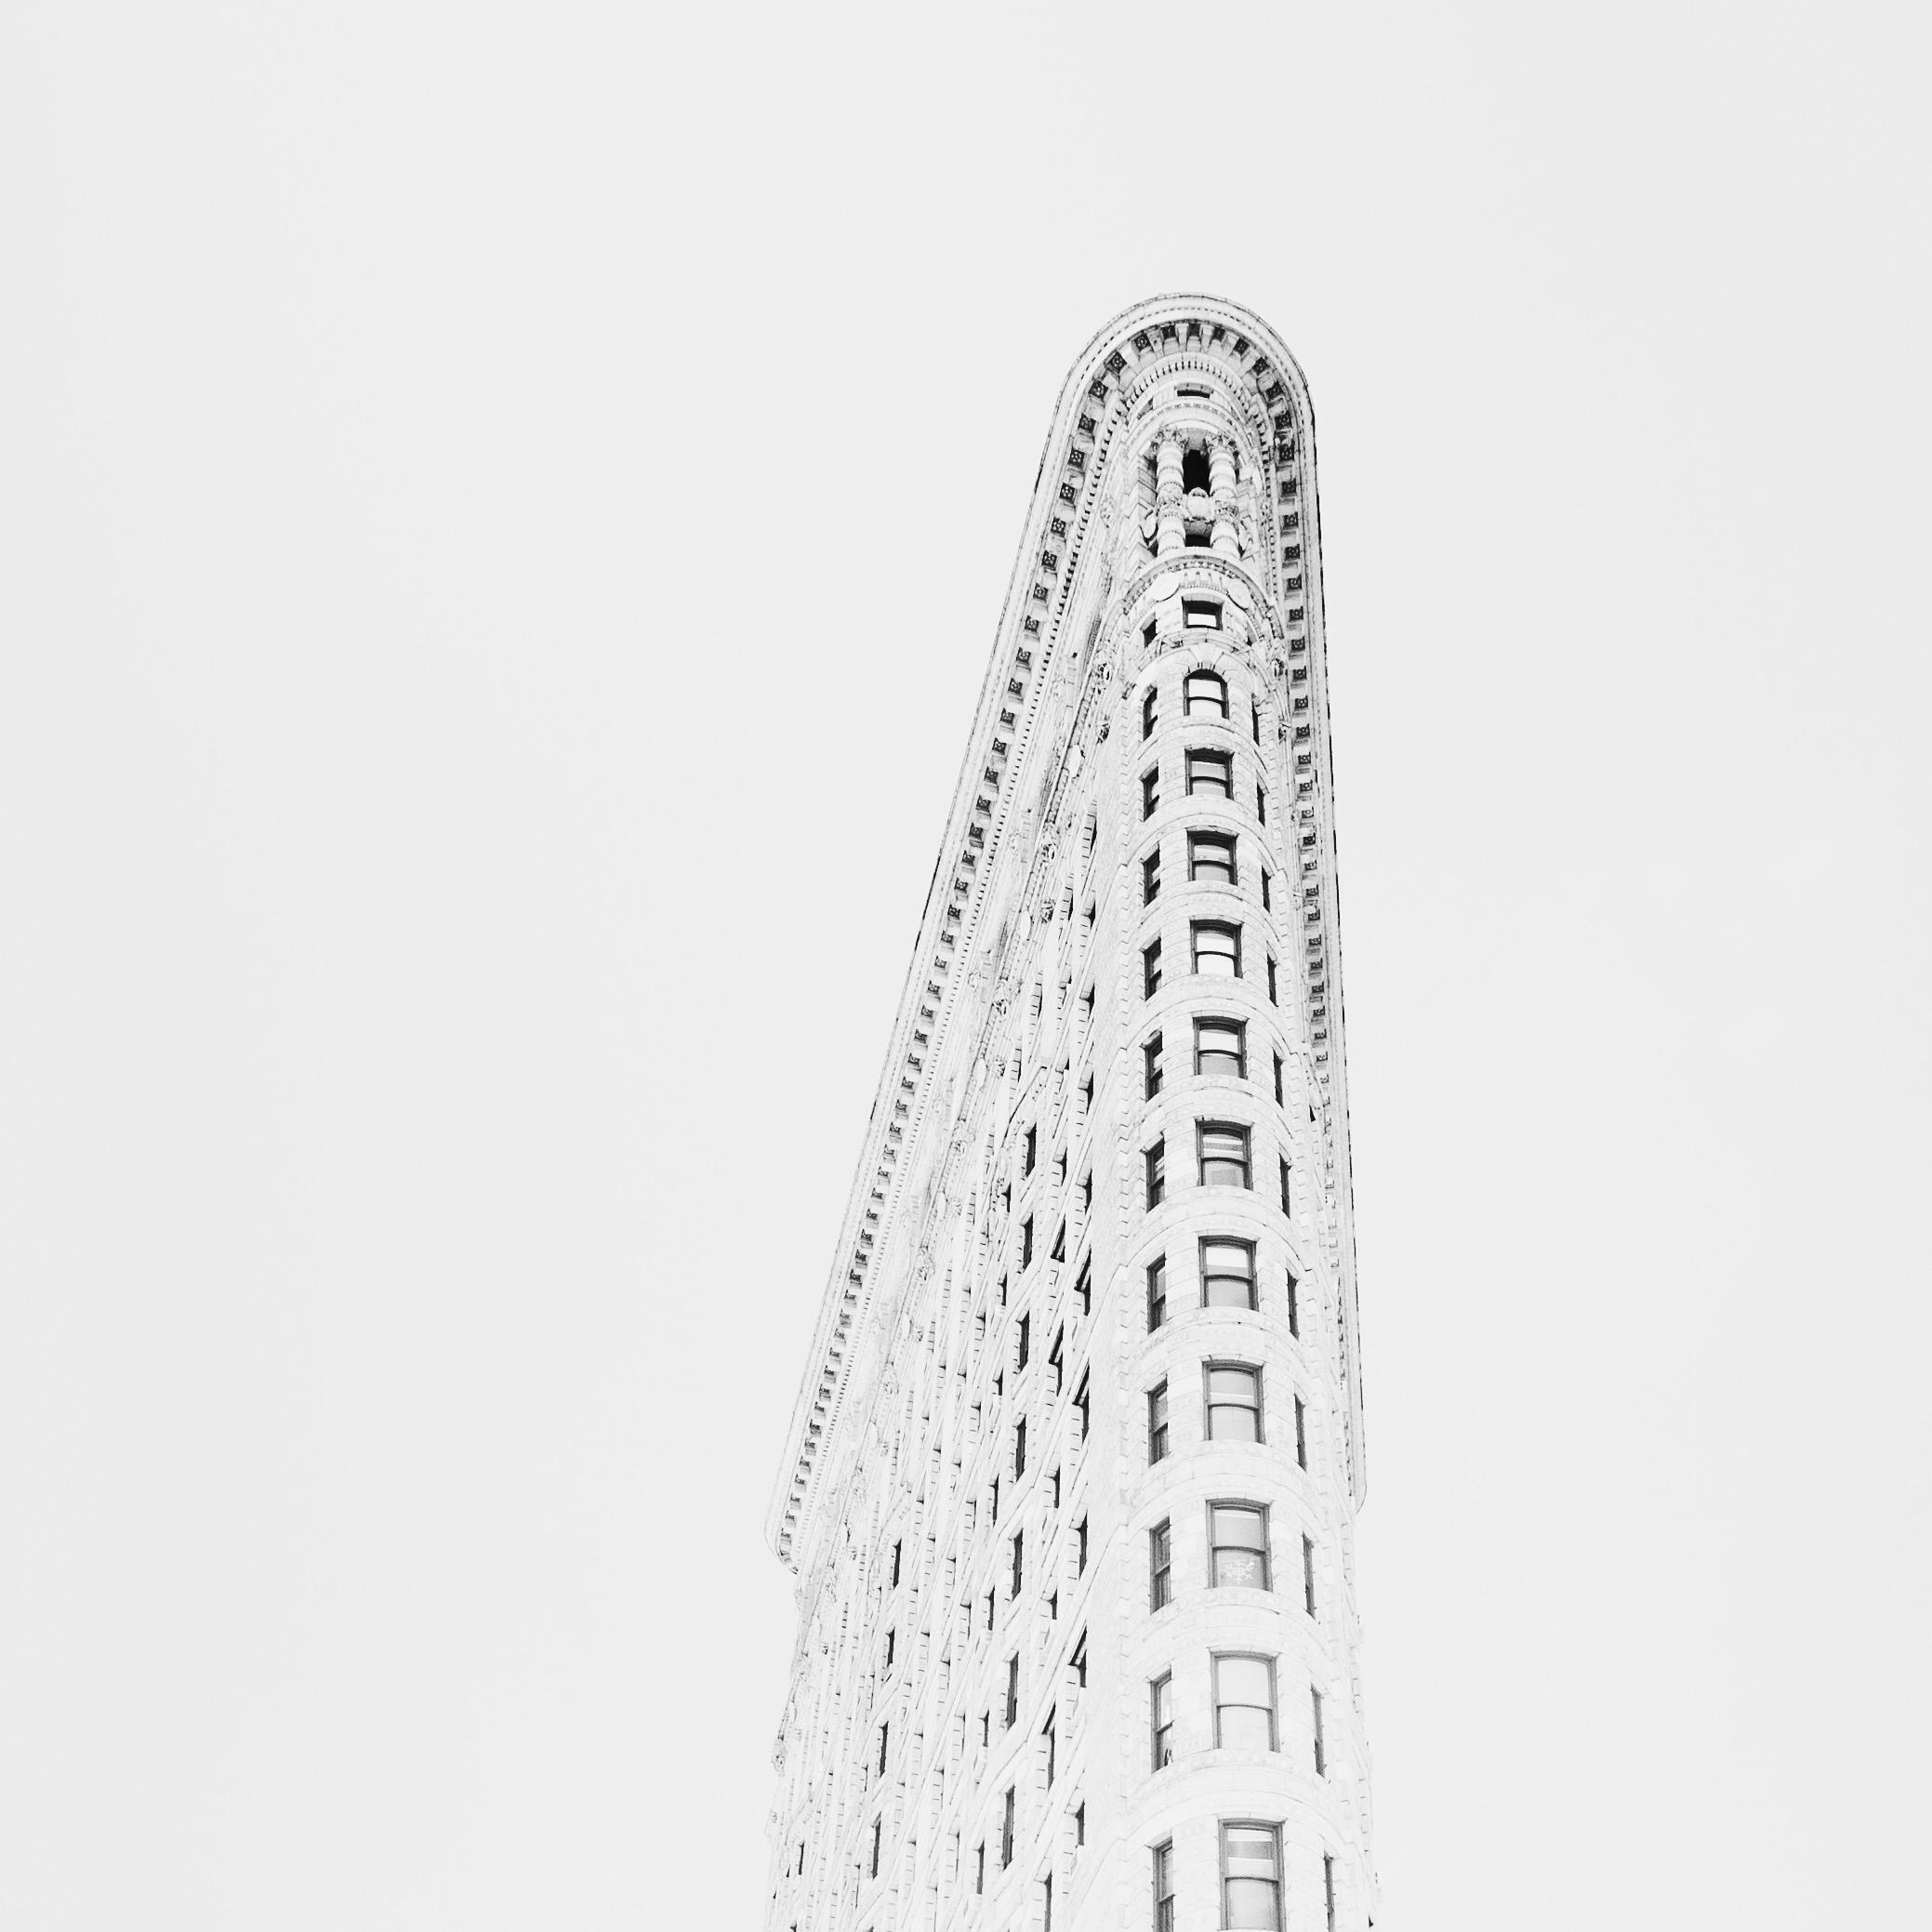 50_Flatiron.jpg